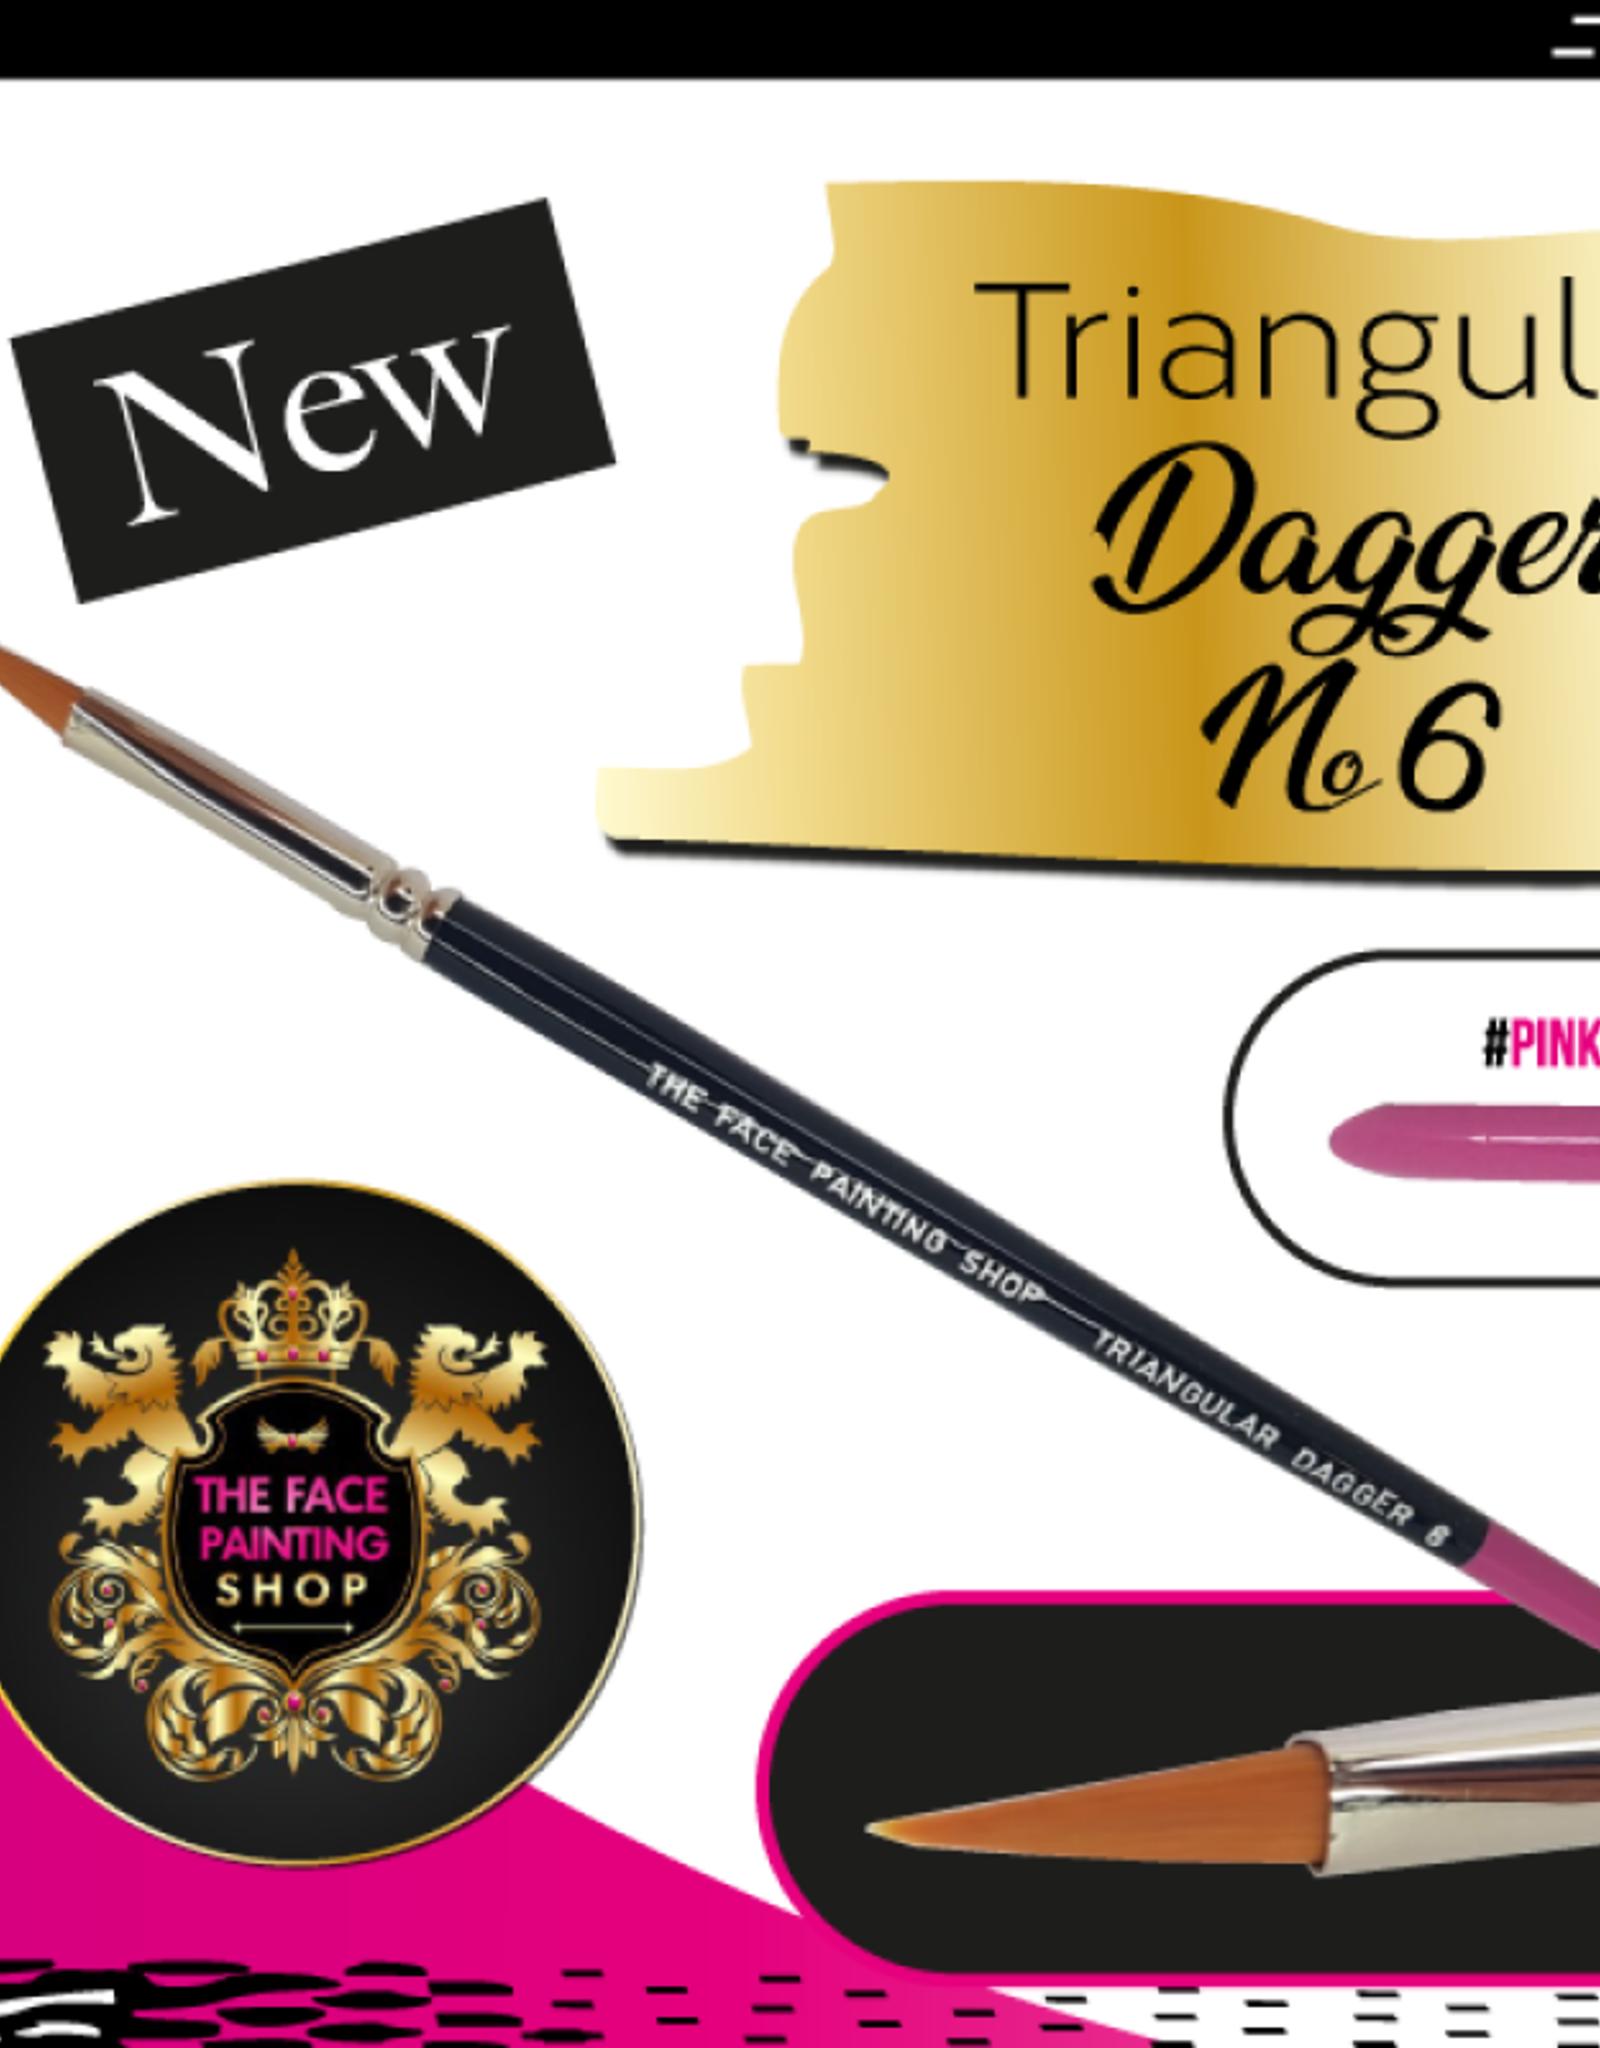 The Facepainting Shop Triangular Dagger Brush 6